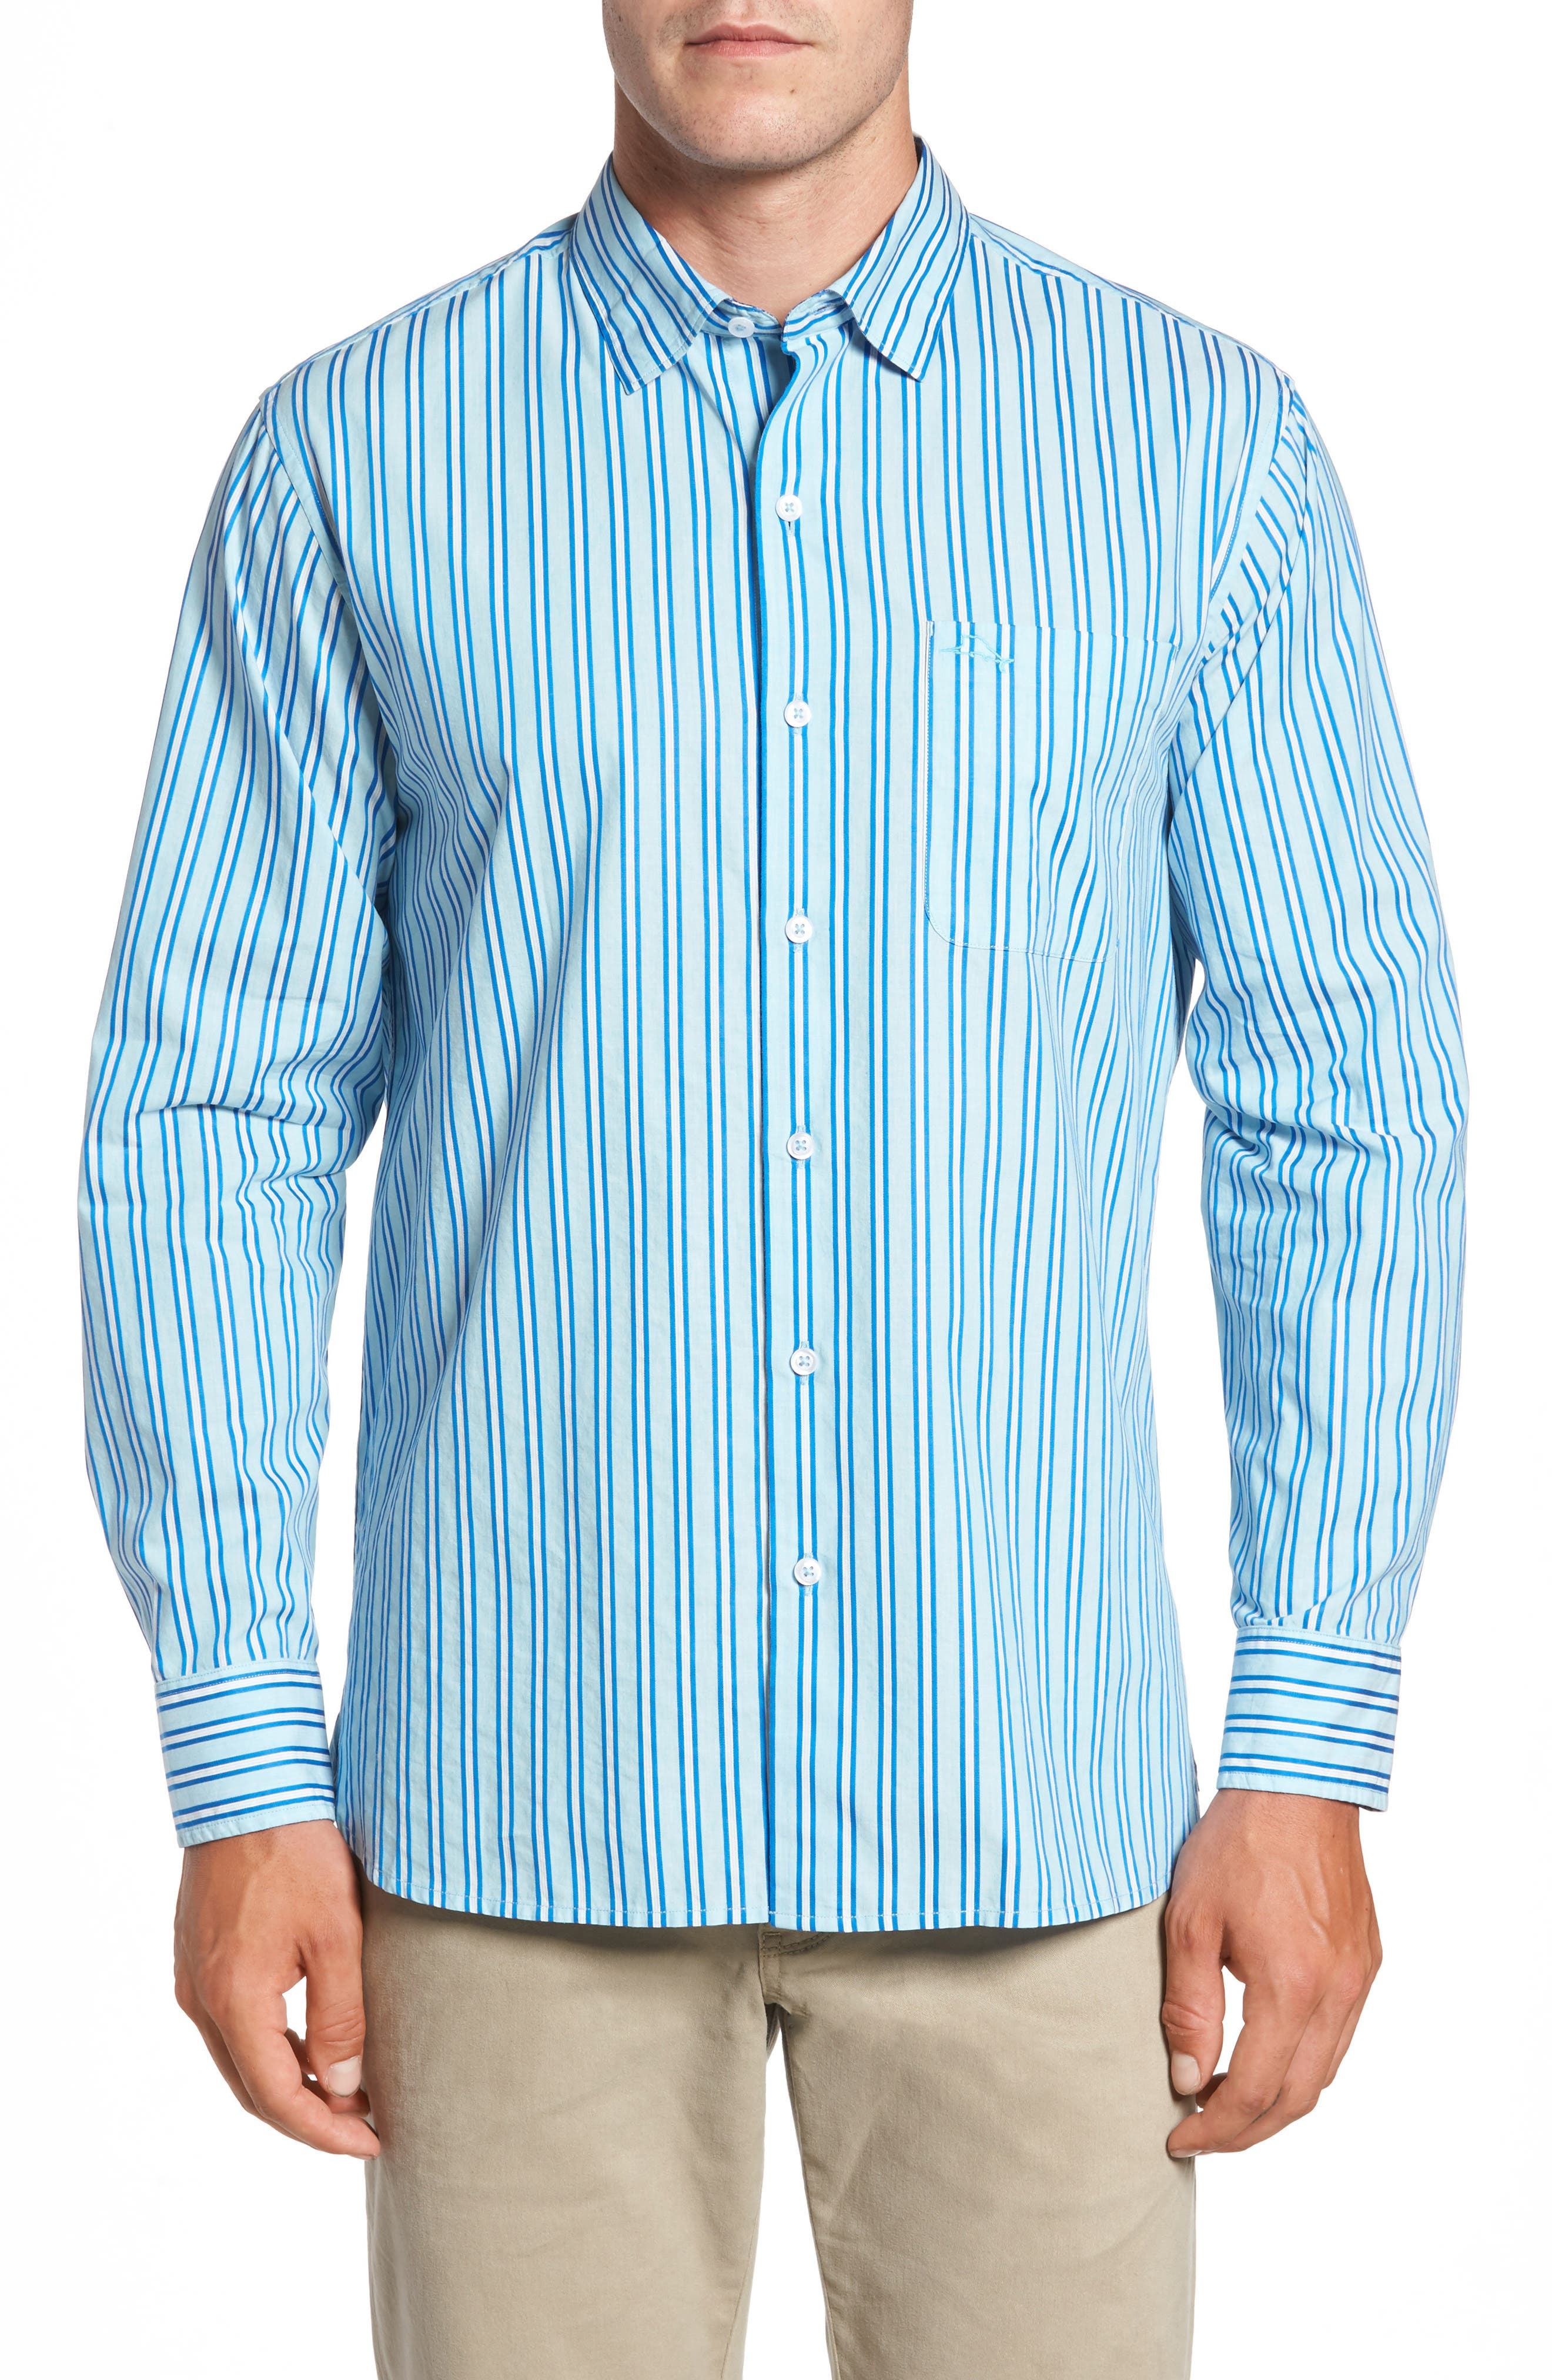 Surf the Line Stripe Sport Shirt,                             Main thumbnail 1, color,                             400